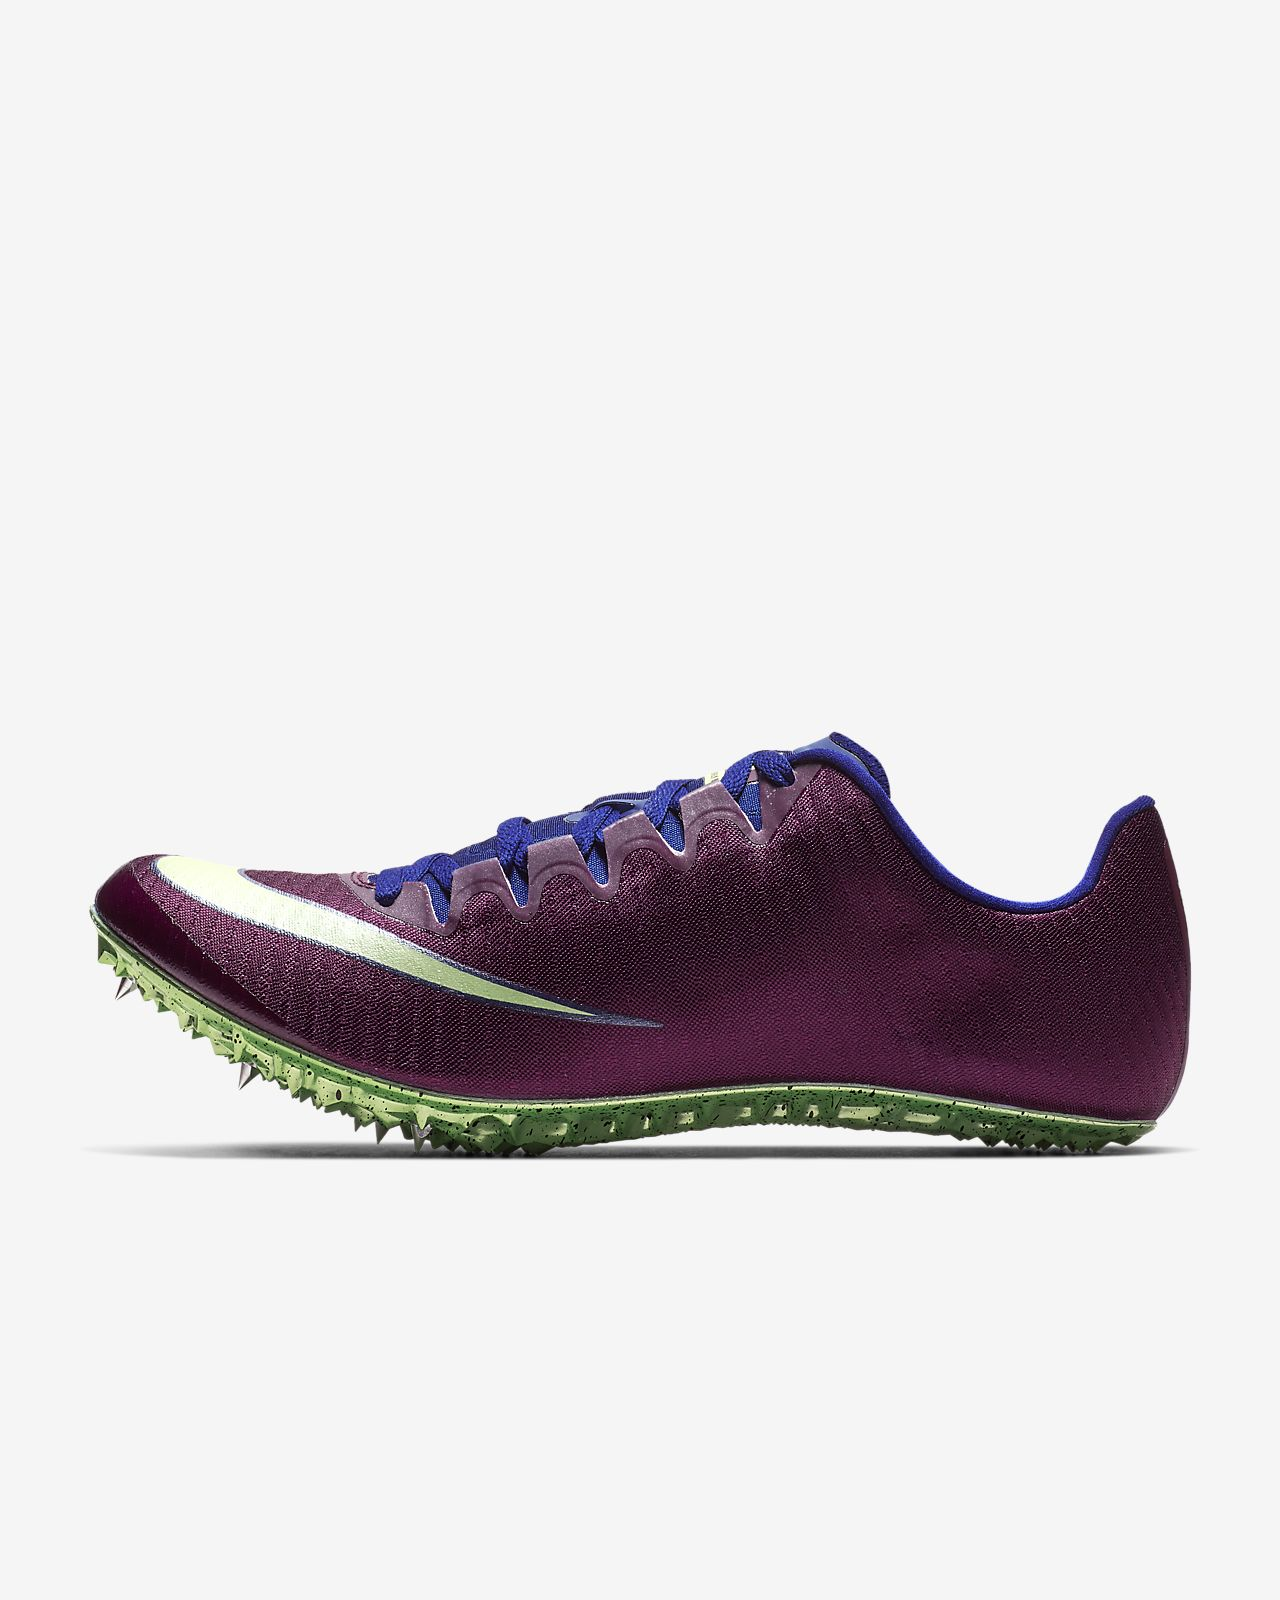 Gara Scarpa It Nike Da Superfly Elite Chiodata wrqrPCE